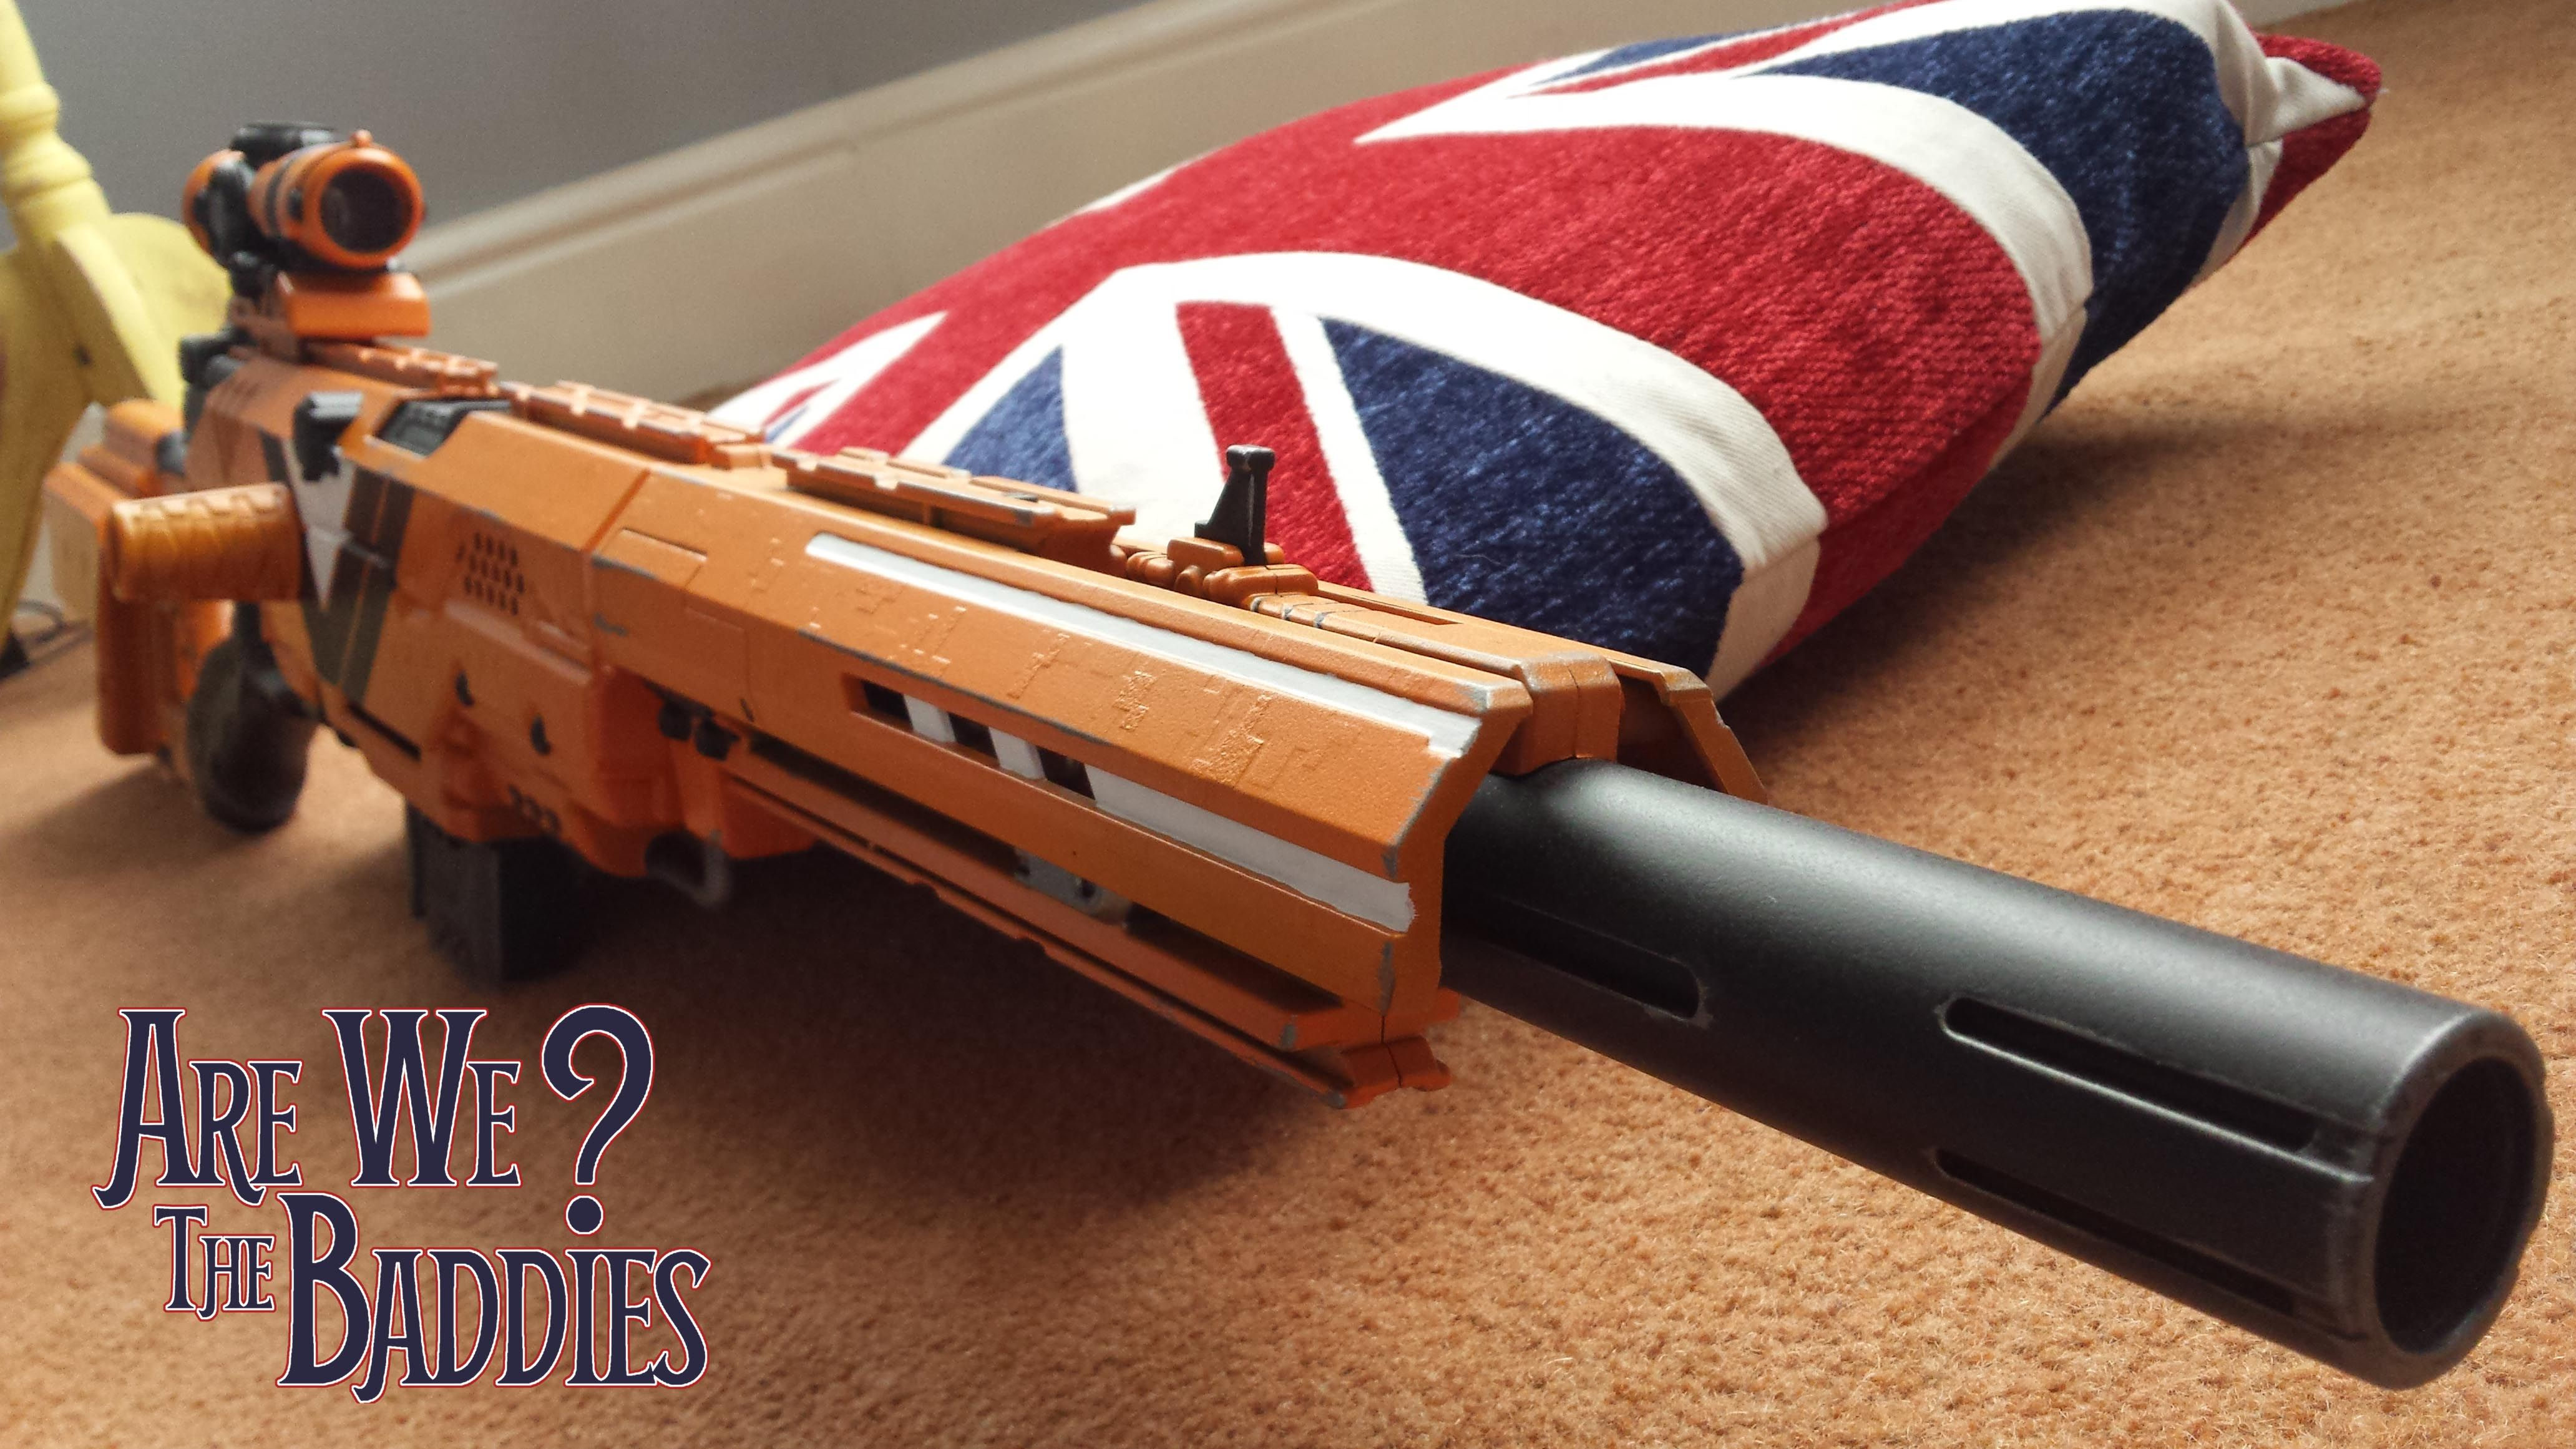 Are we the baddies - customised Nerf guns - Home